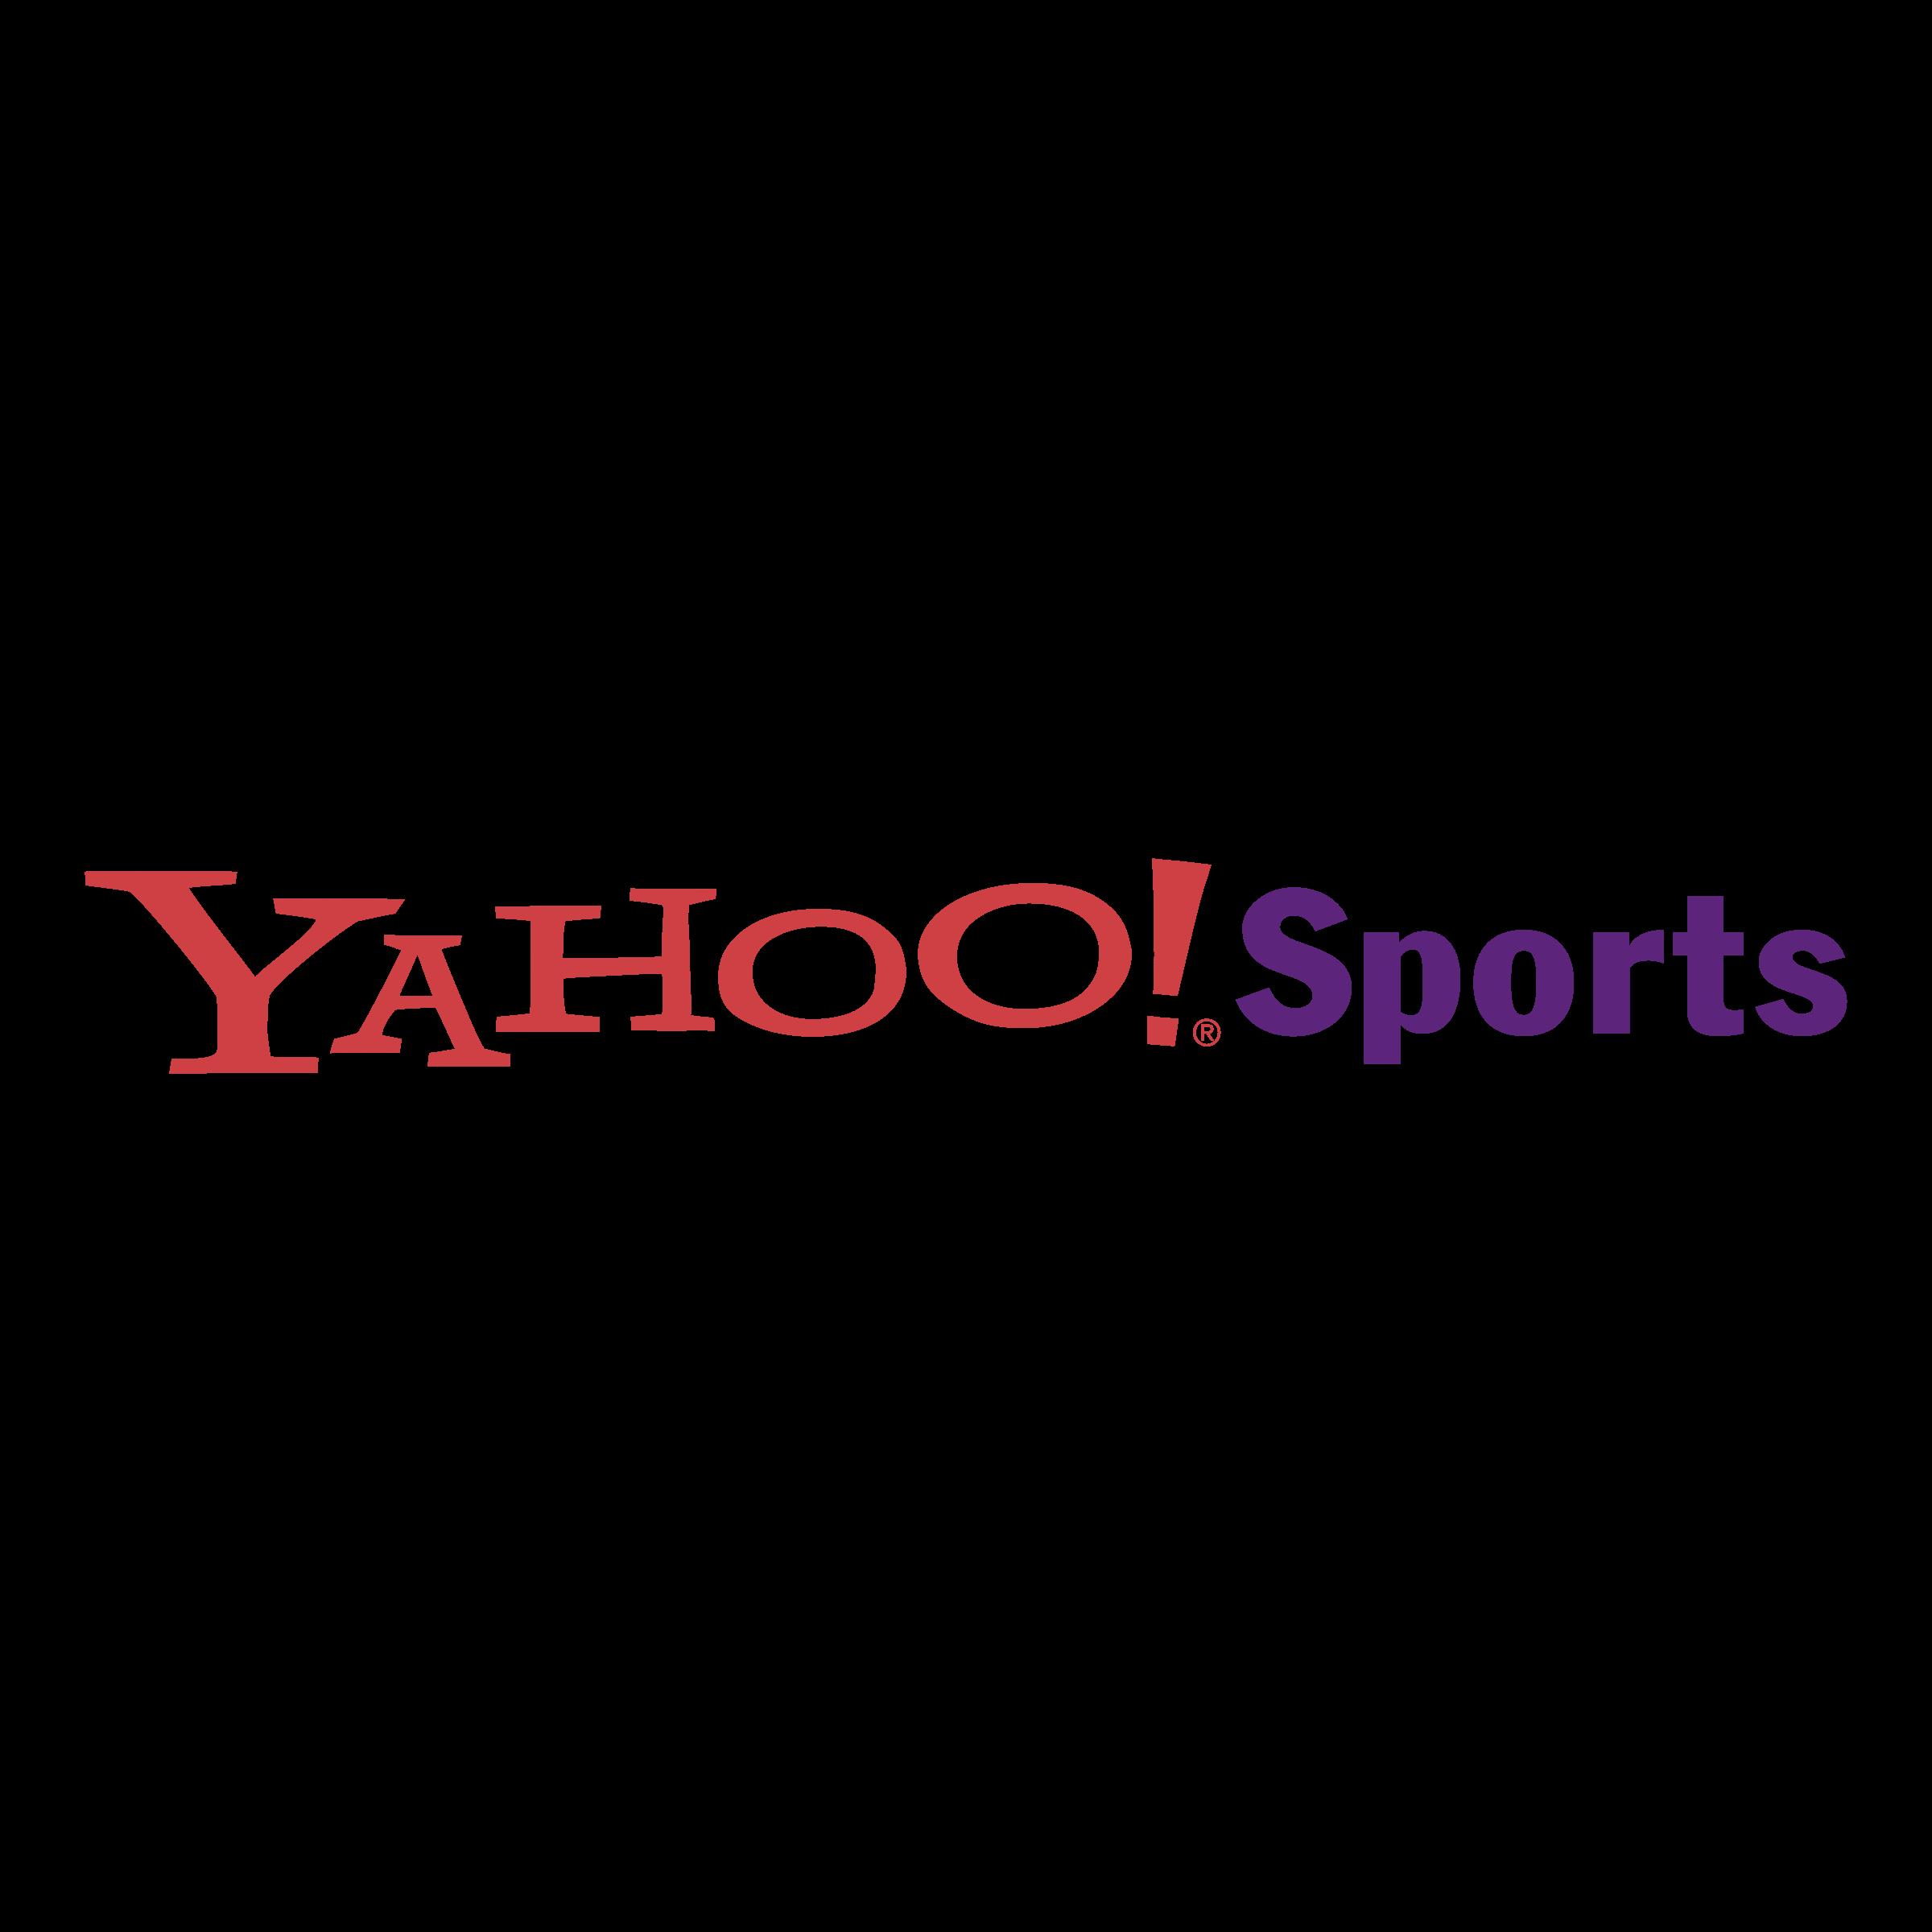 Yahoo! Sports Logo PNG Transparent & SVG Vector.